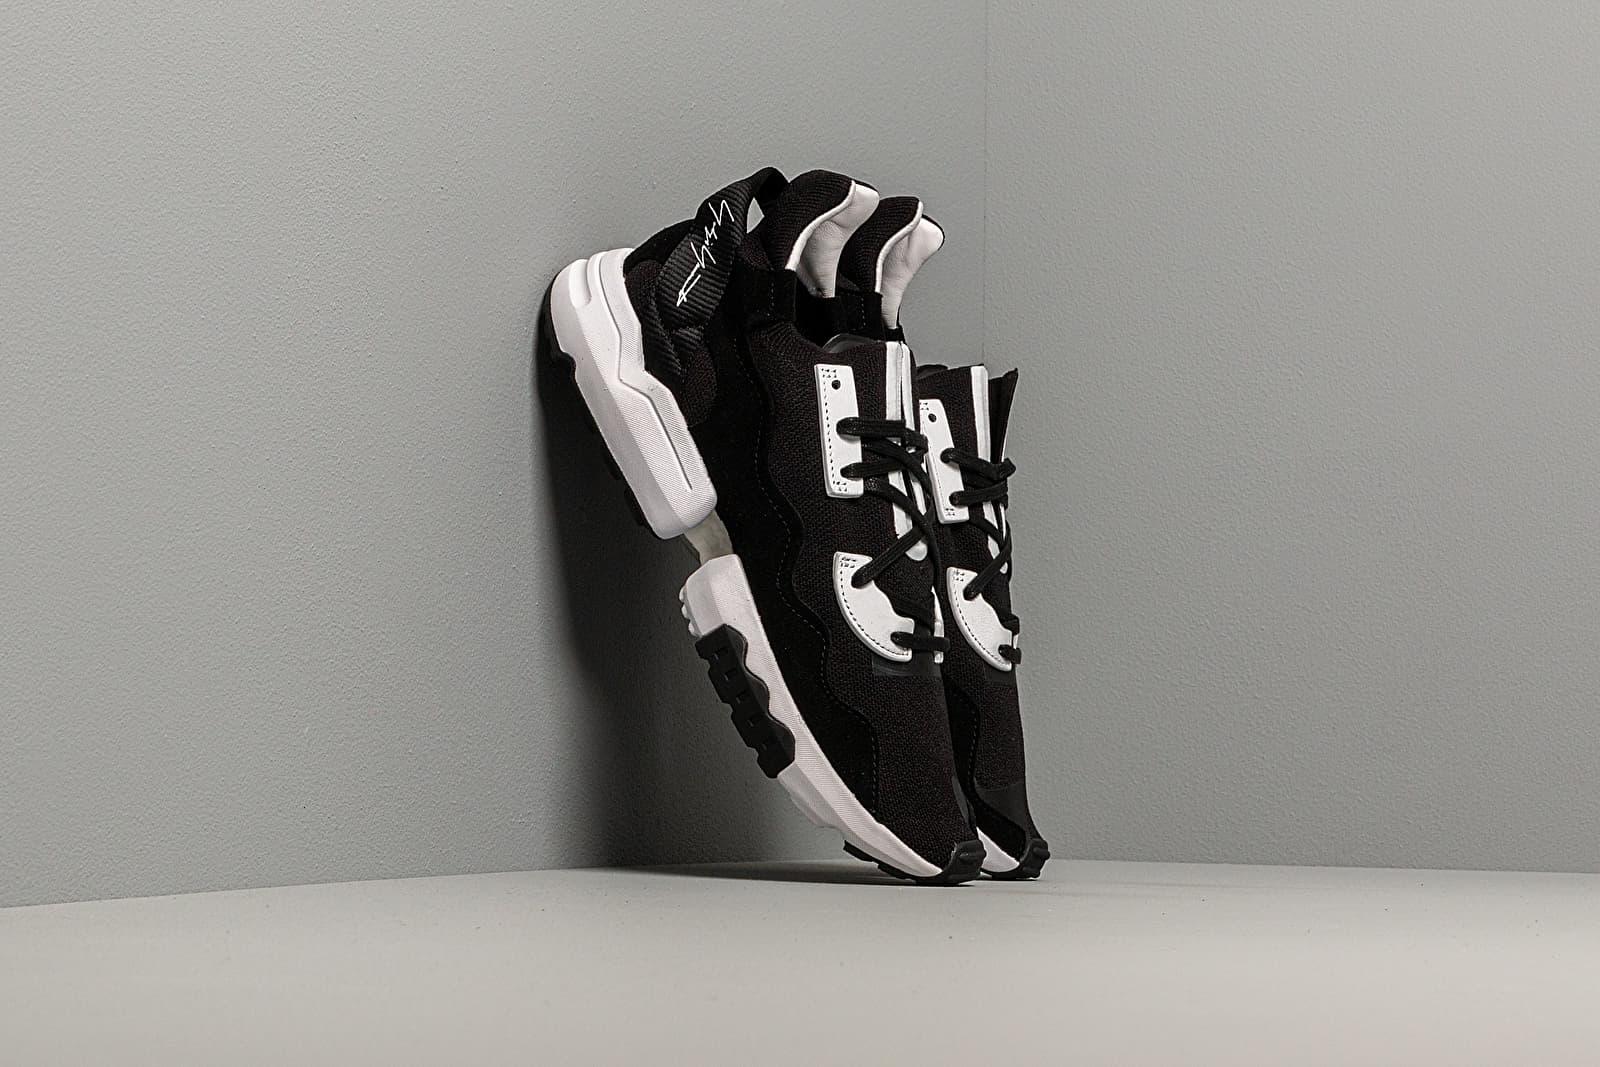 Men's shoes Y-3 ZX Torsion Black-Y3/ Ftwr White/ Black-Y3